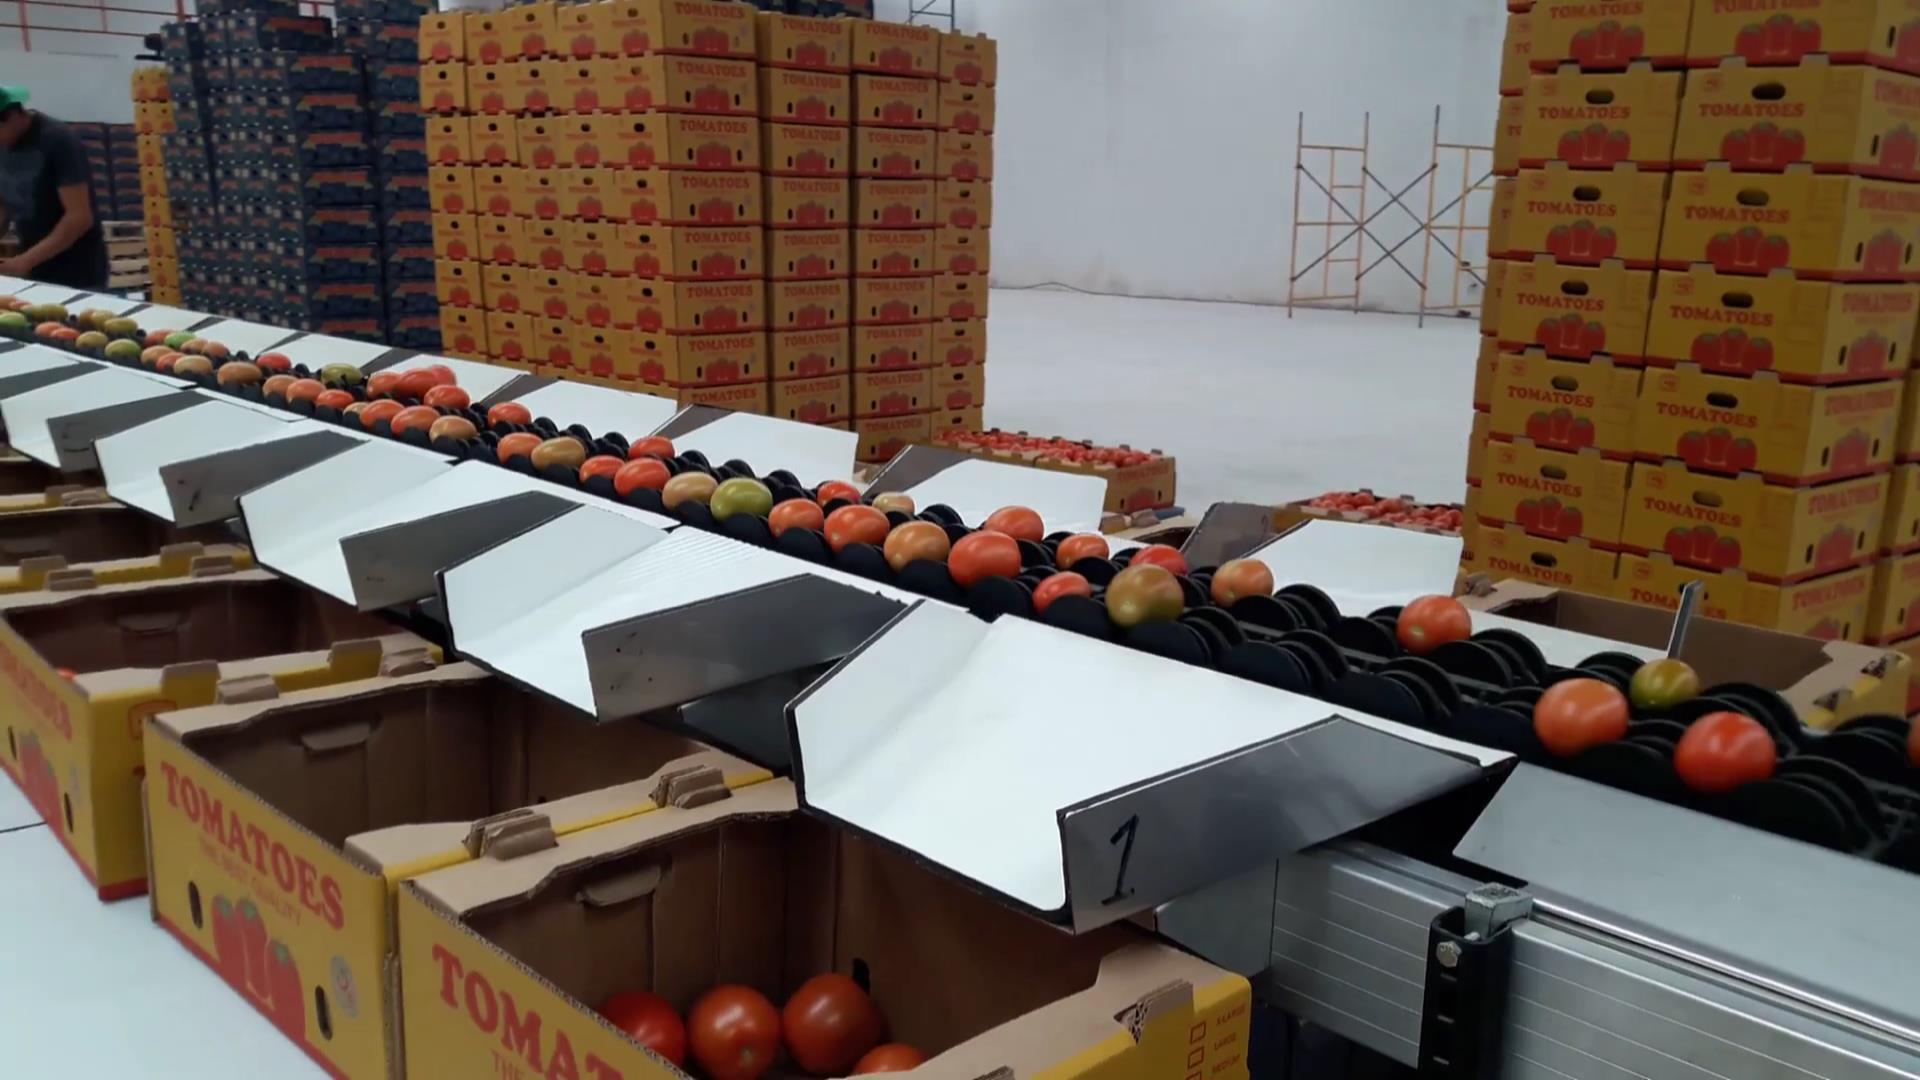 Tomato 02.jpg